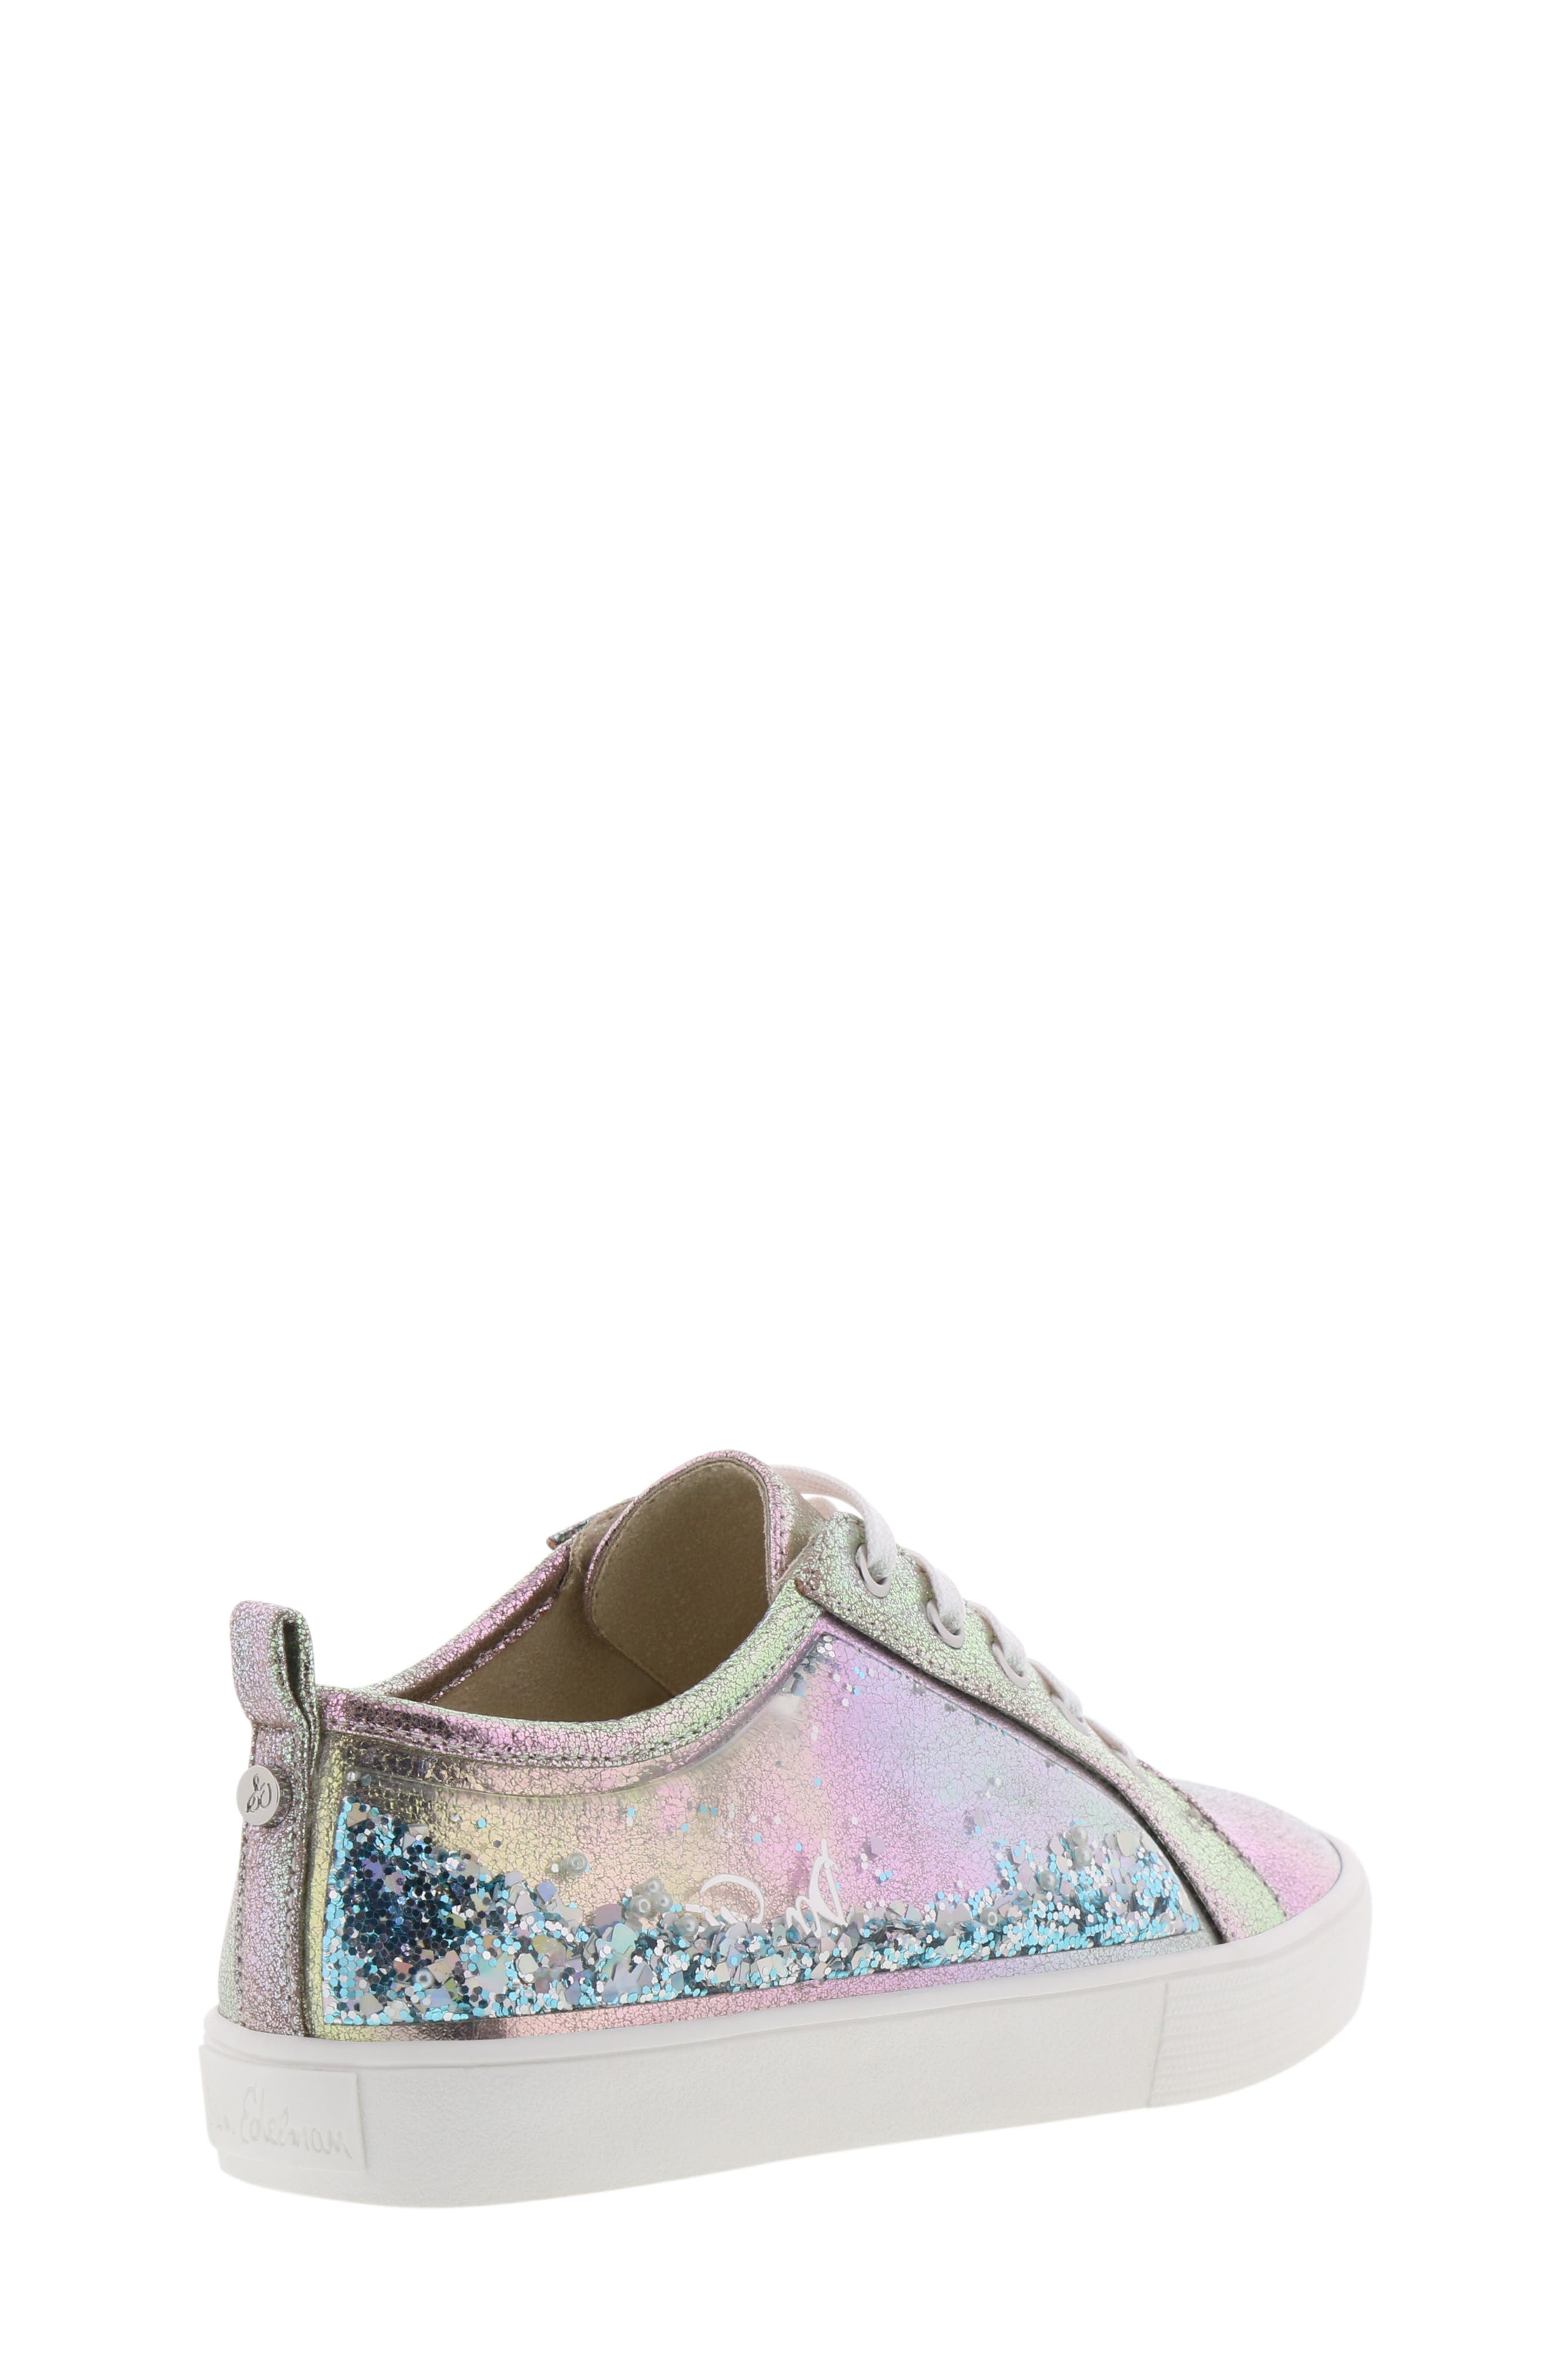 Bella Aqua Slip-On Sneaker,                             Alternate thumbnail 2, color,                             GASOLINE IRIDESCENT